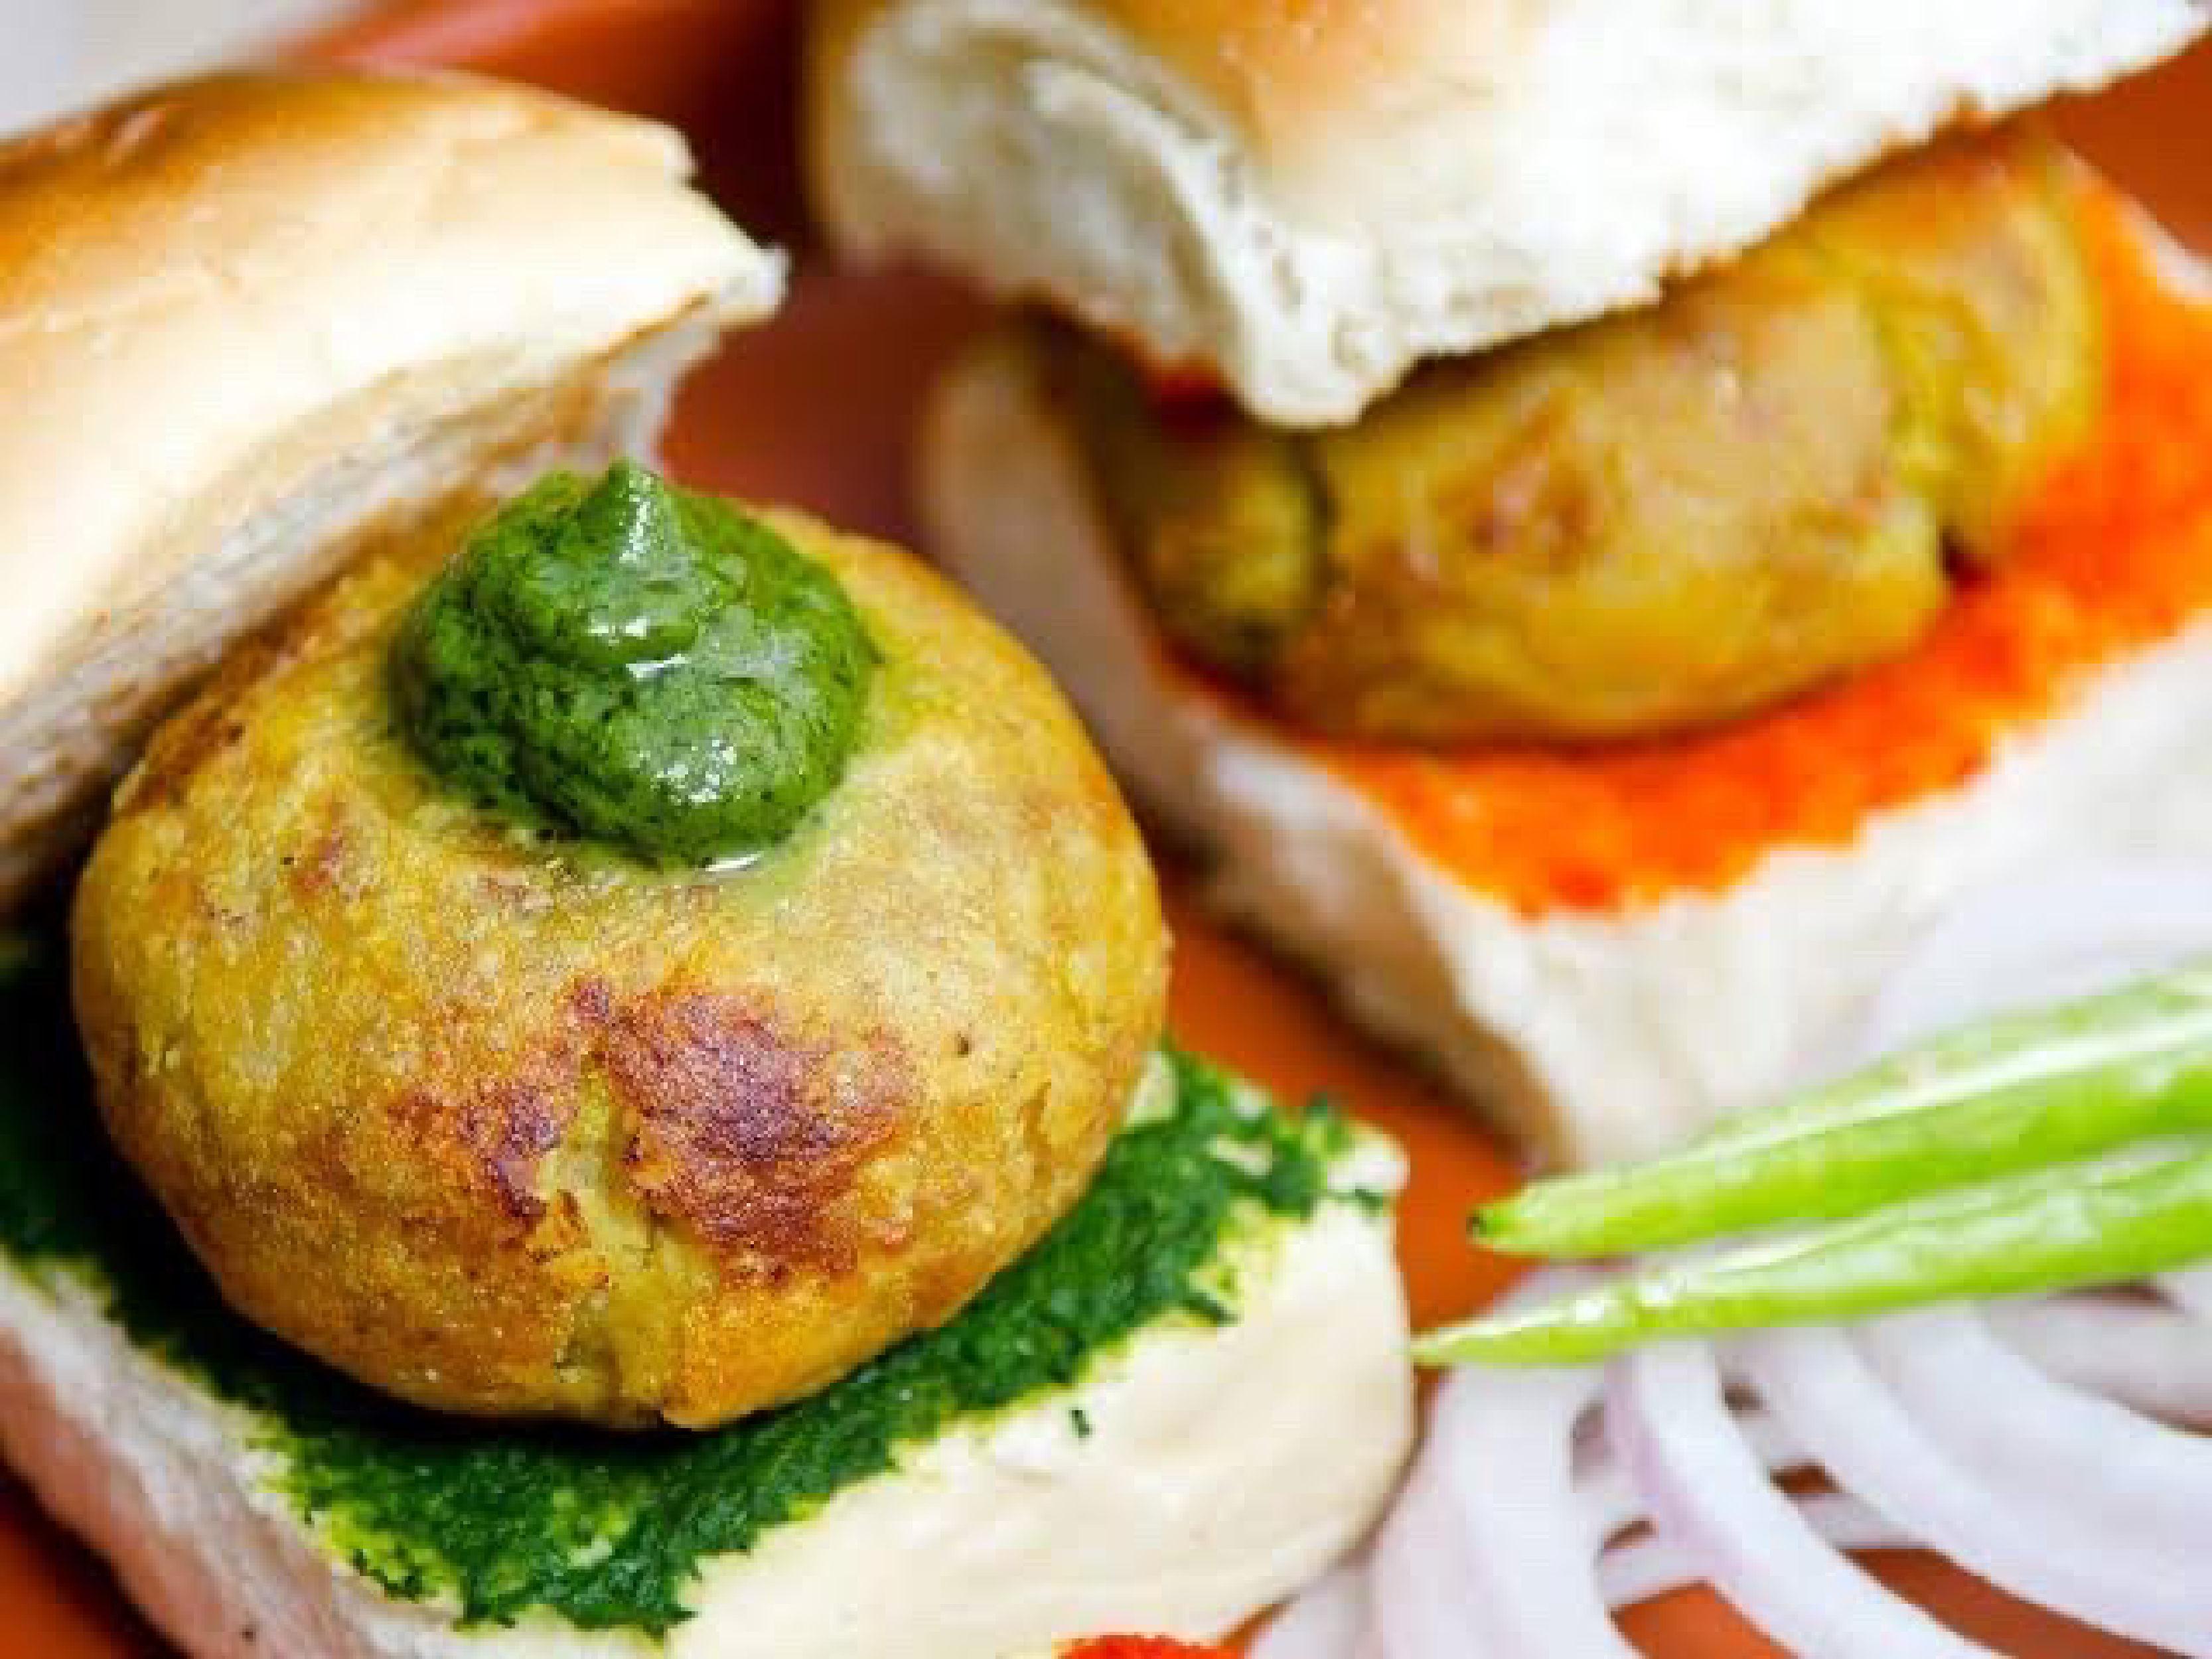 Vada Pav is the most popular street food option!